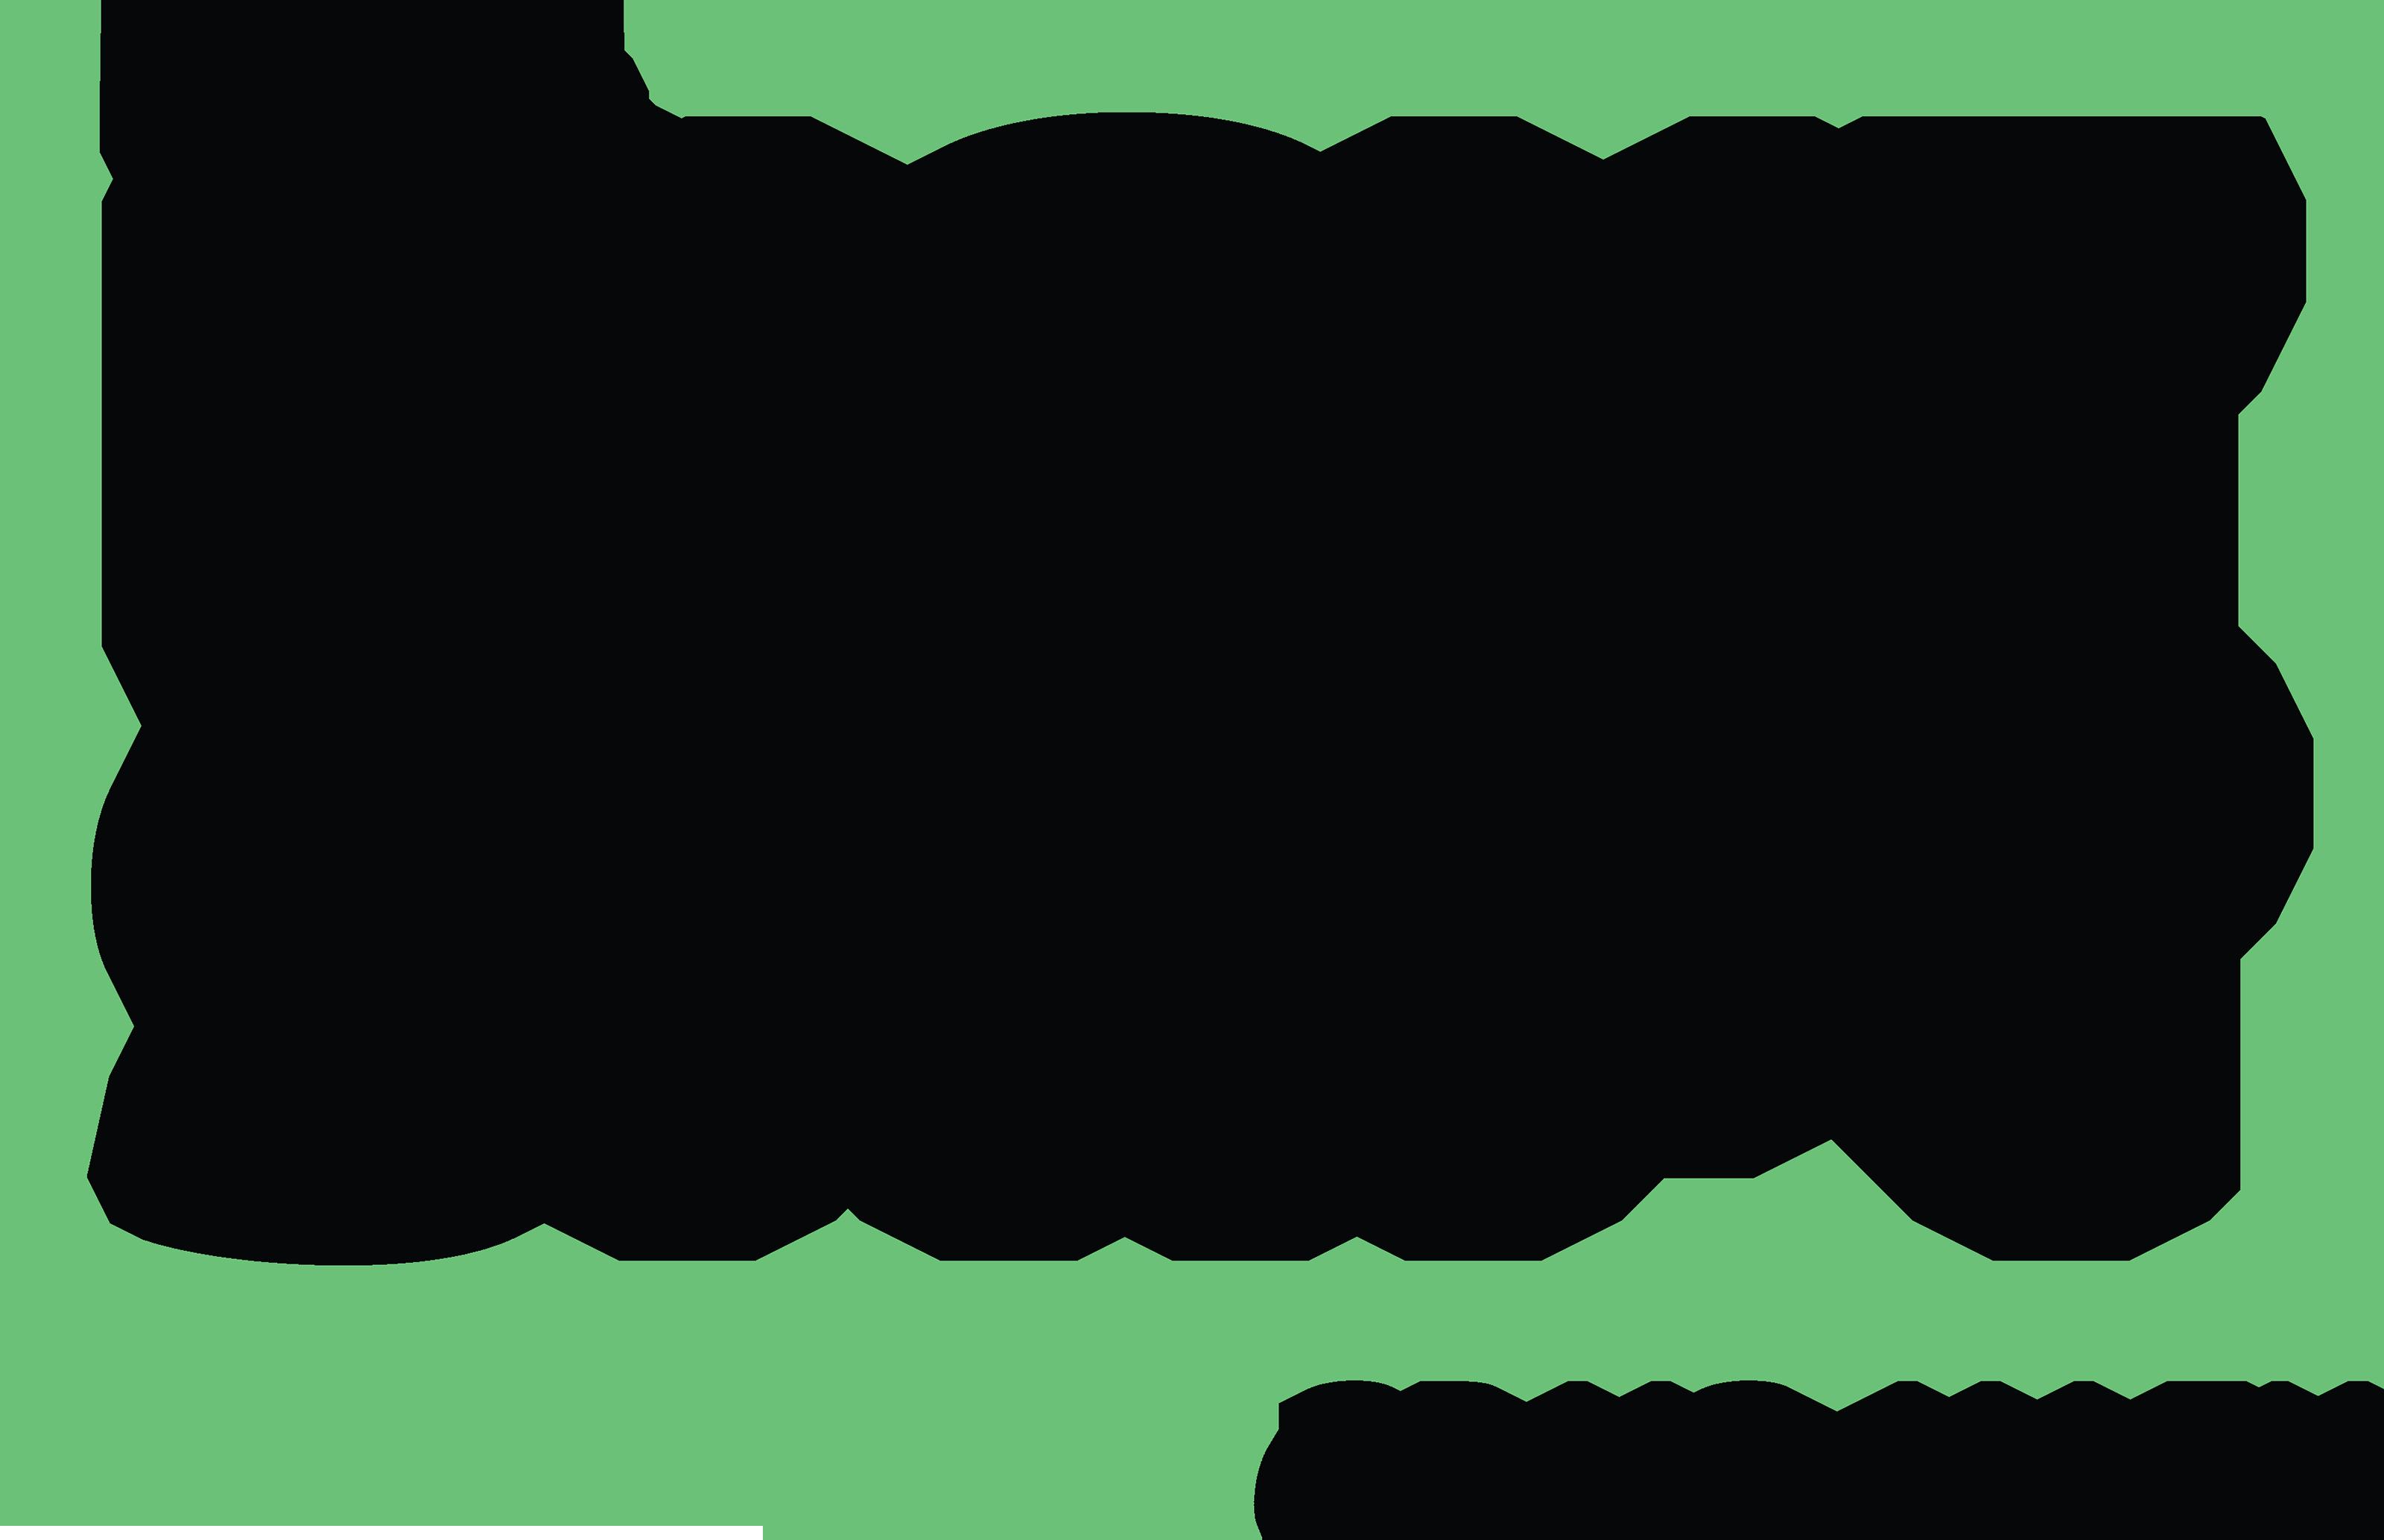 TheNightShiftCraigAllenOFFICIALLOGO-Knb